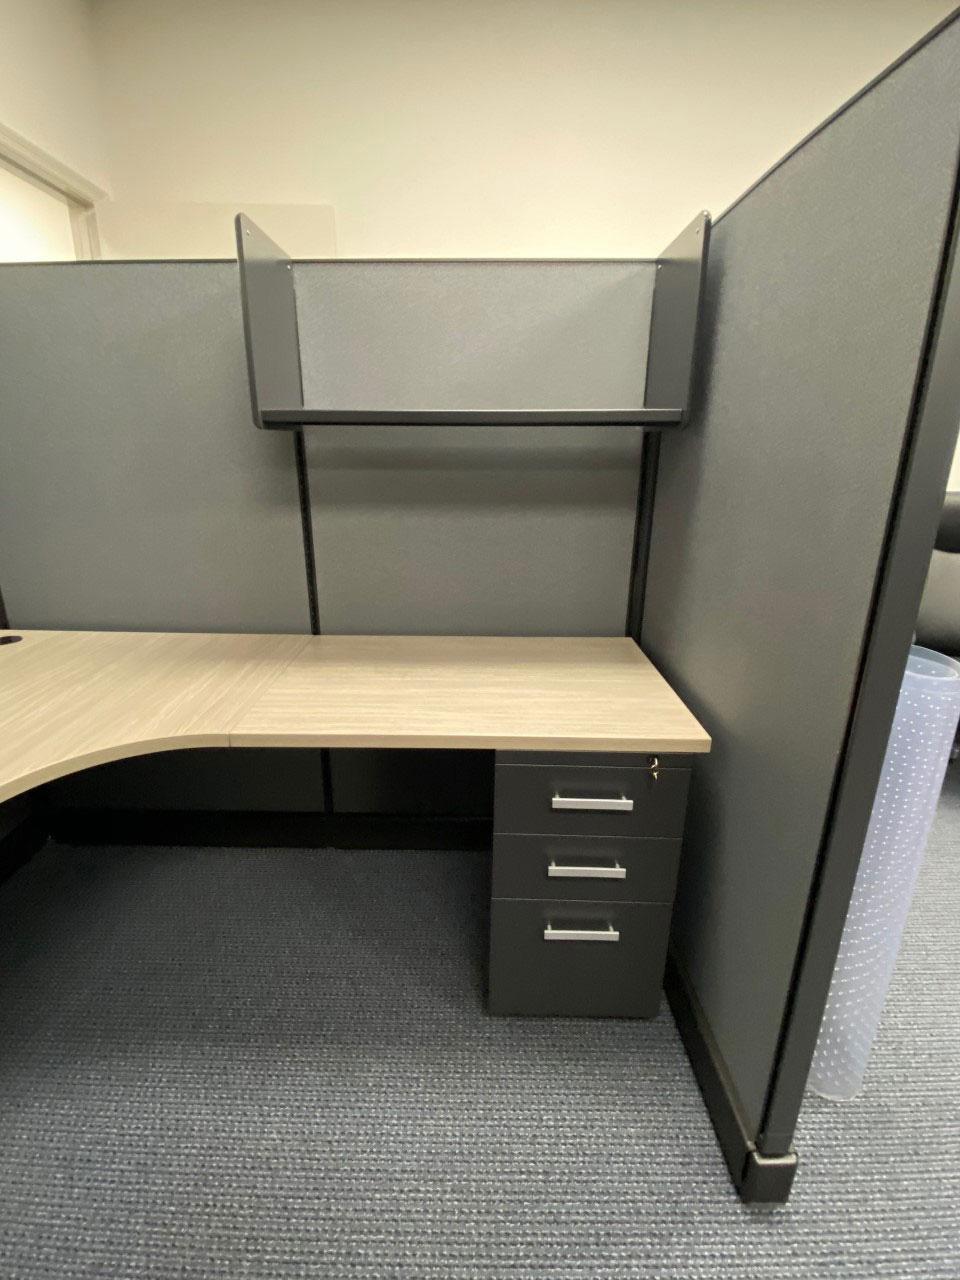 office-cubicle-furniture-suppliers-in-bradenton-florida-8.jpg